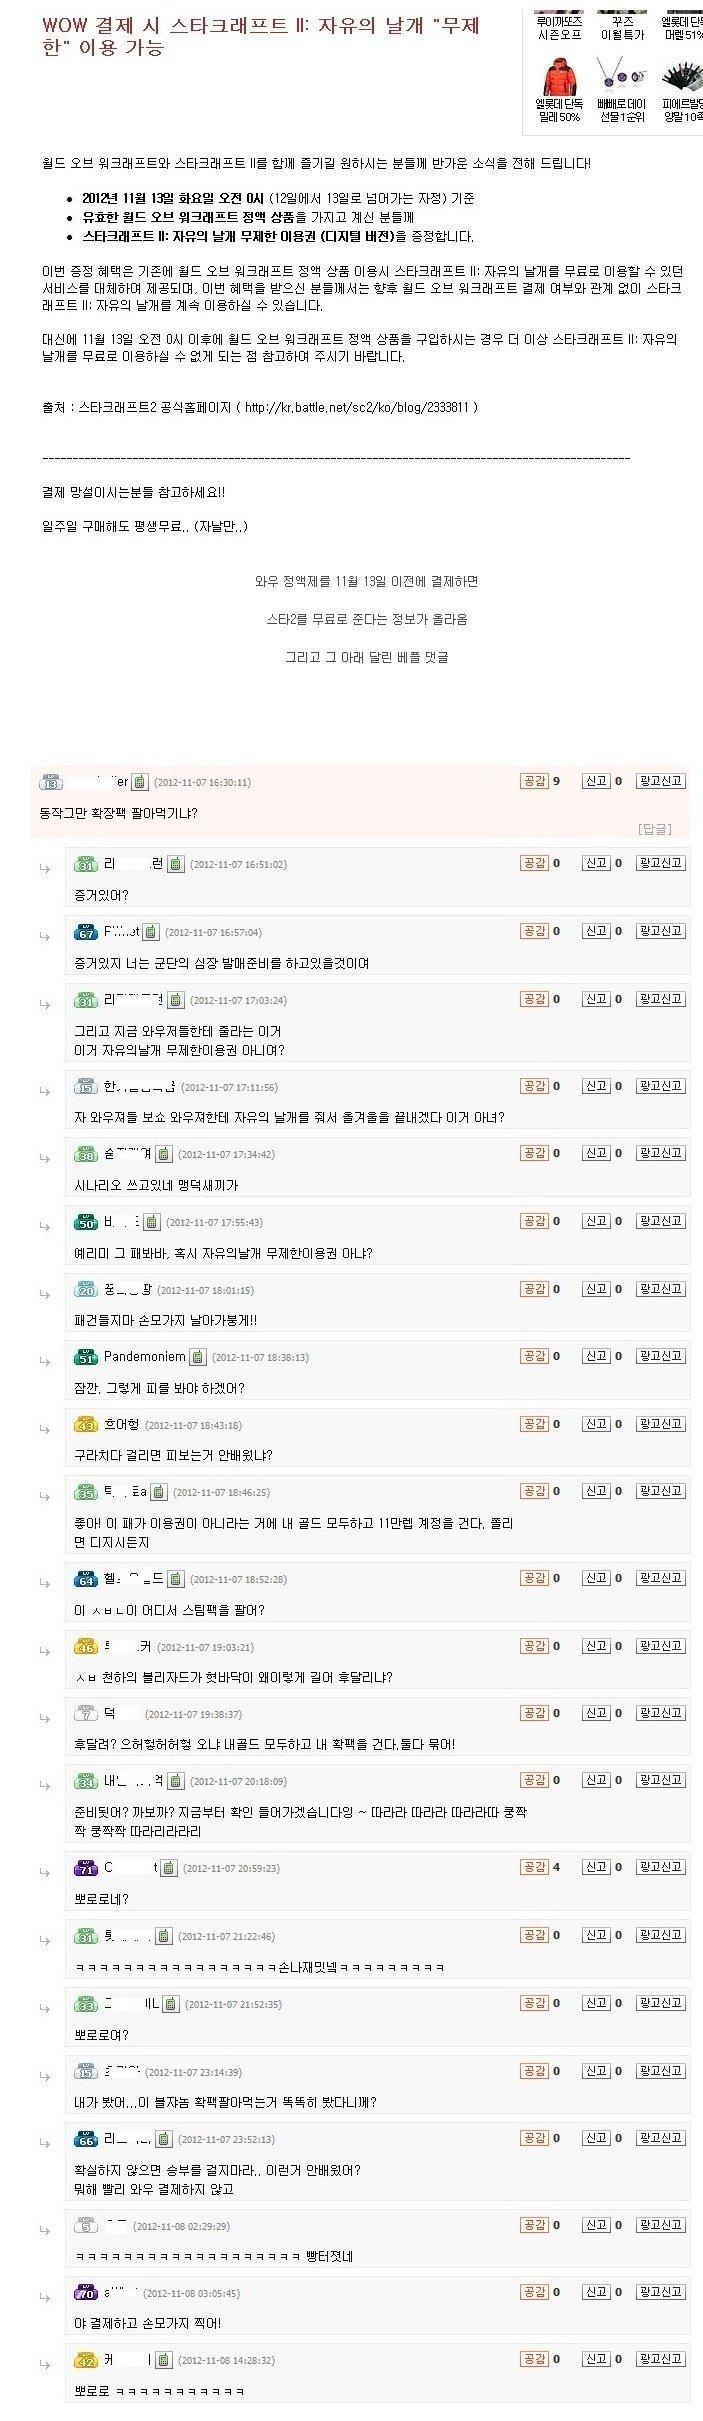 6.jpg 커뮤니티별 타짜 패러디 댓글.jpg